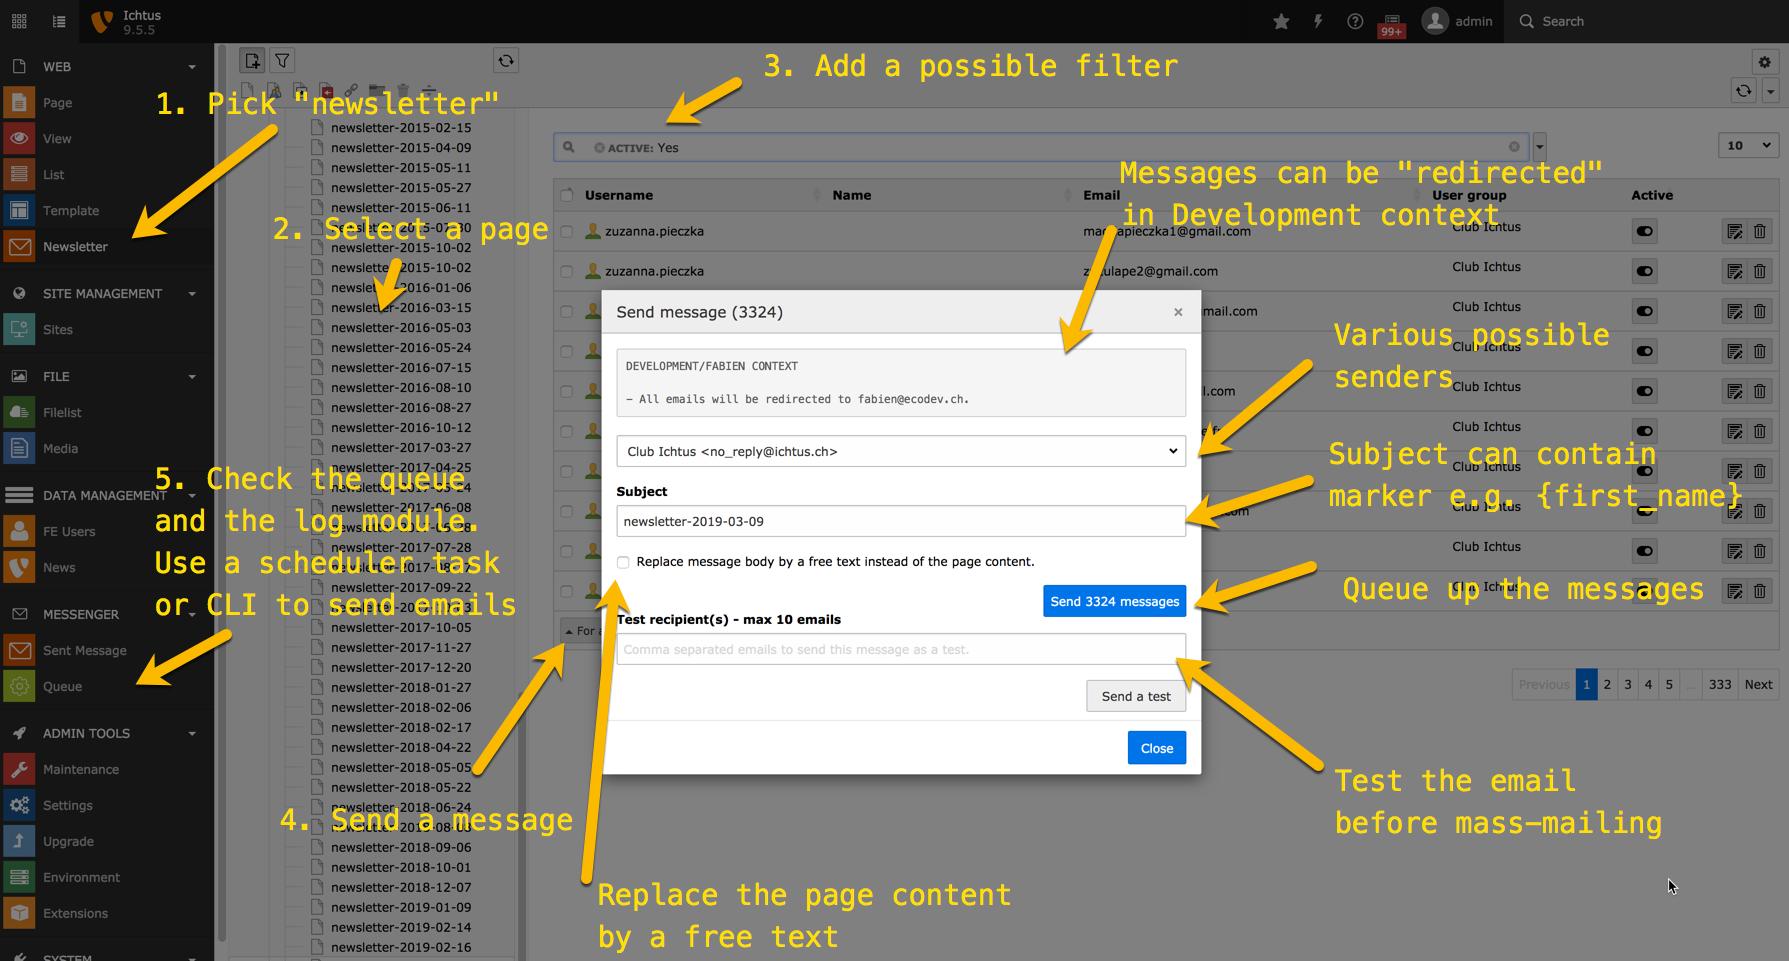 https://raw.github.com/fabarea/messenger/master/Documentation/Screenshot.png